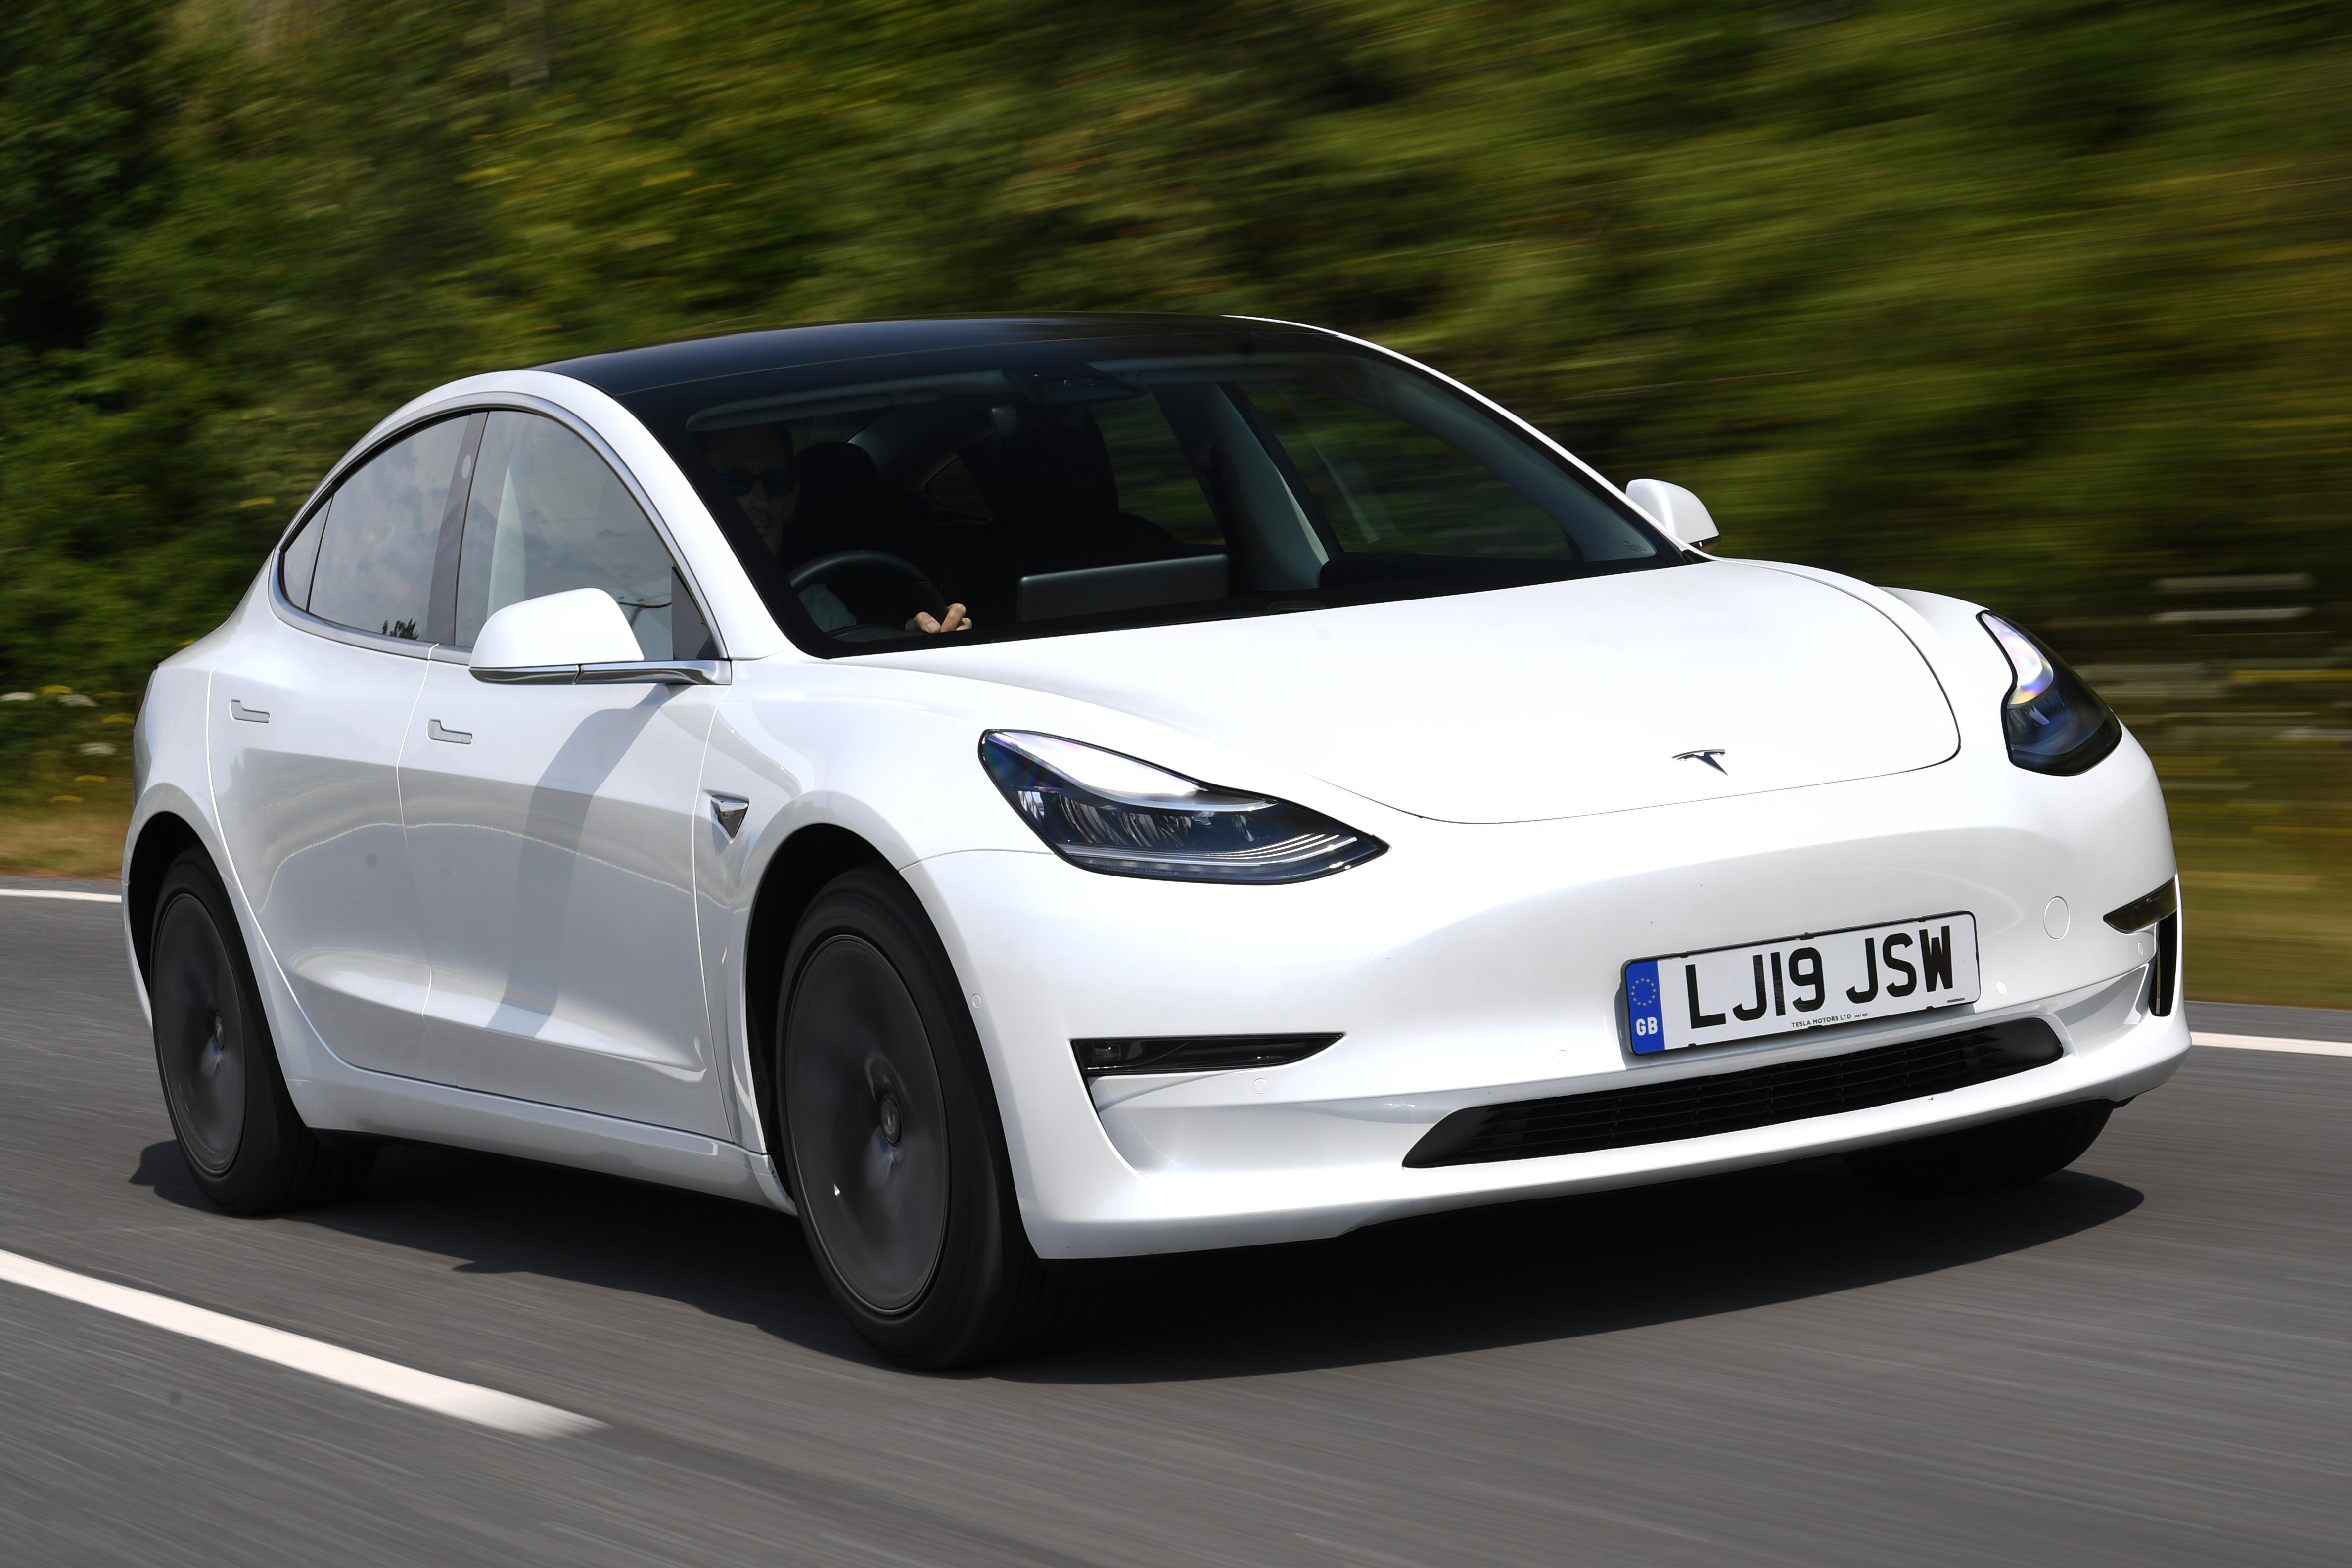 New Tesla Model 3 Standard Range Plus 2019 review | Auto ...